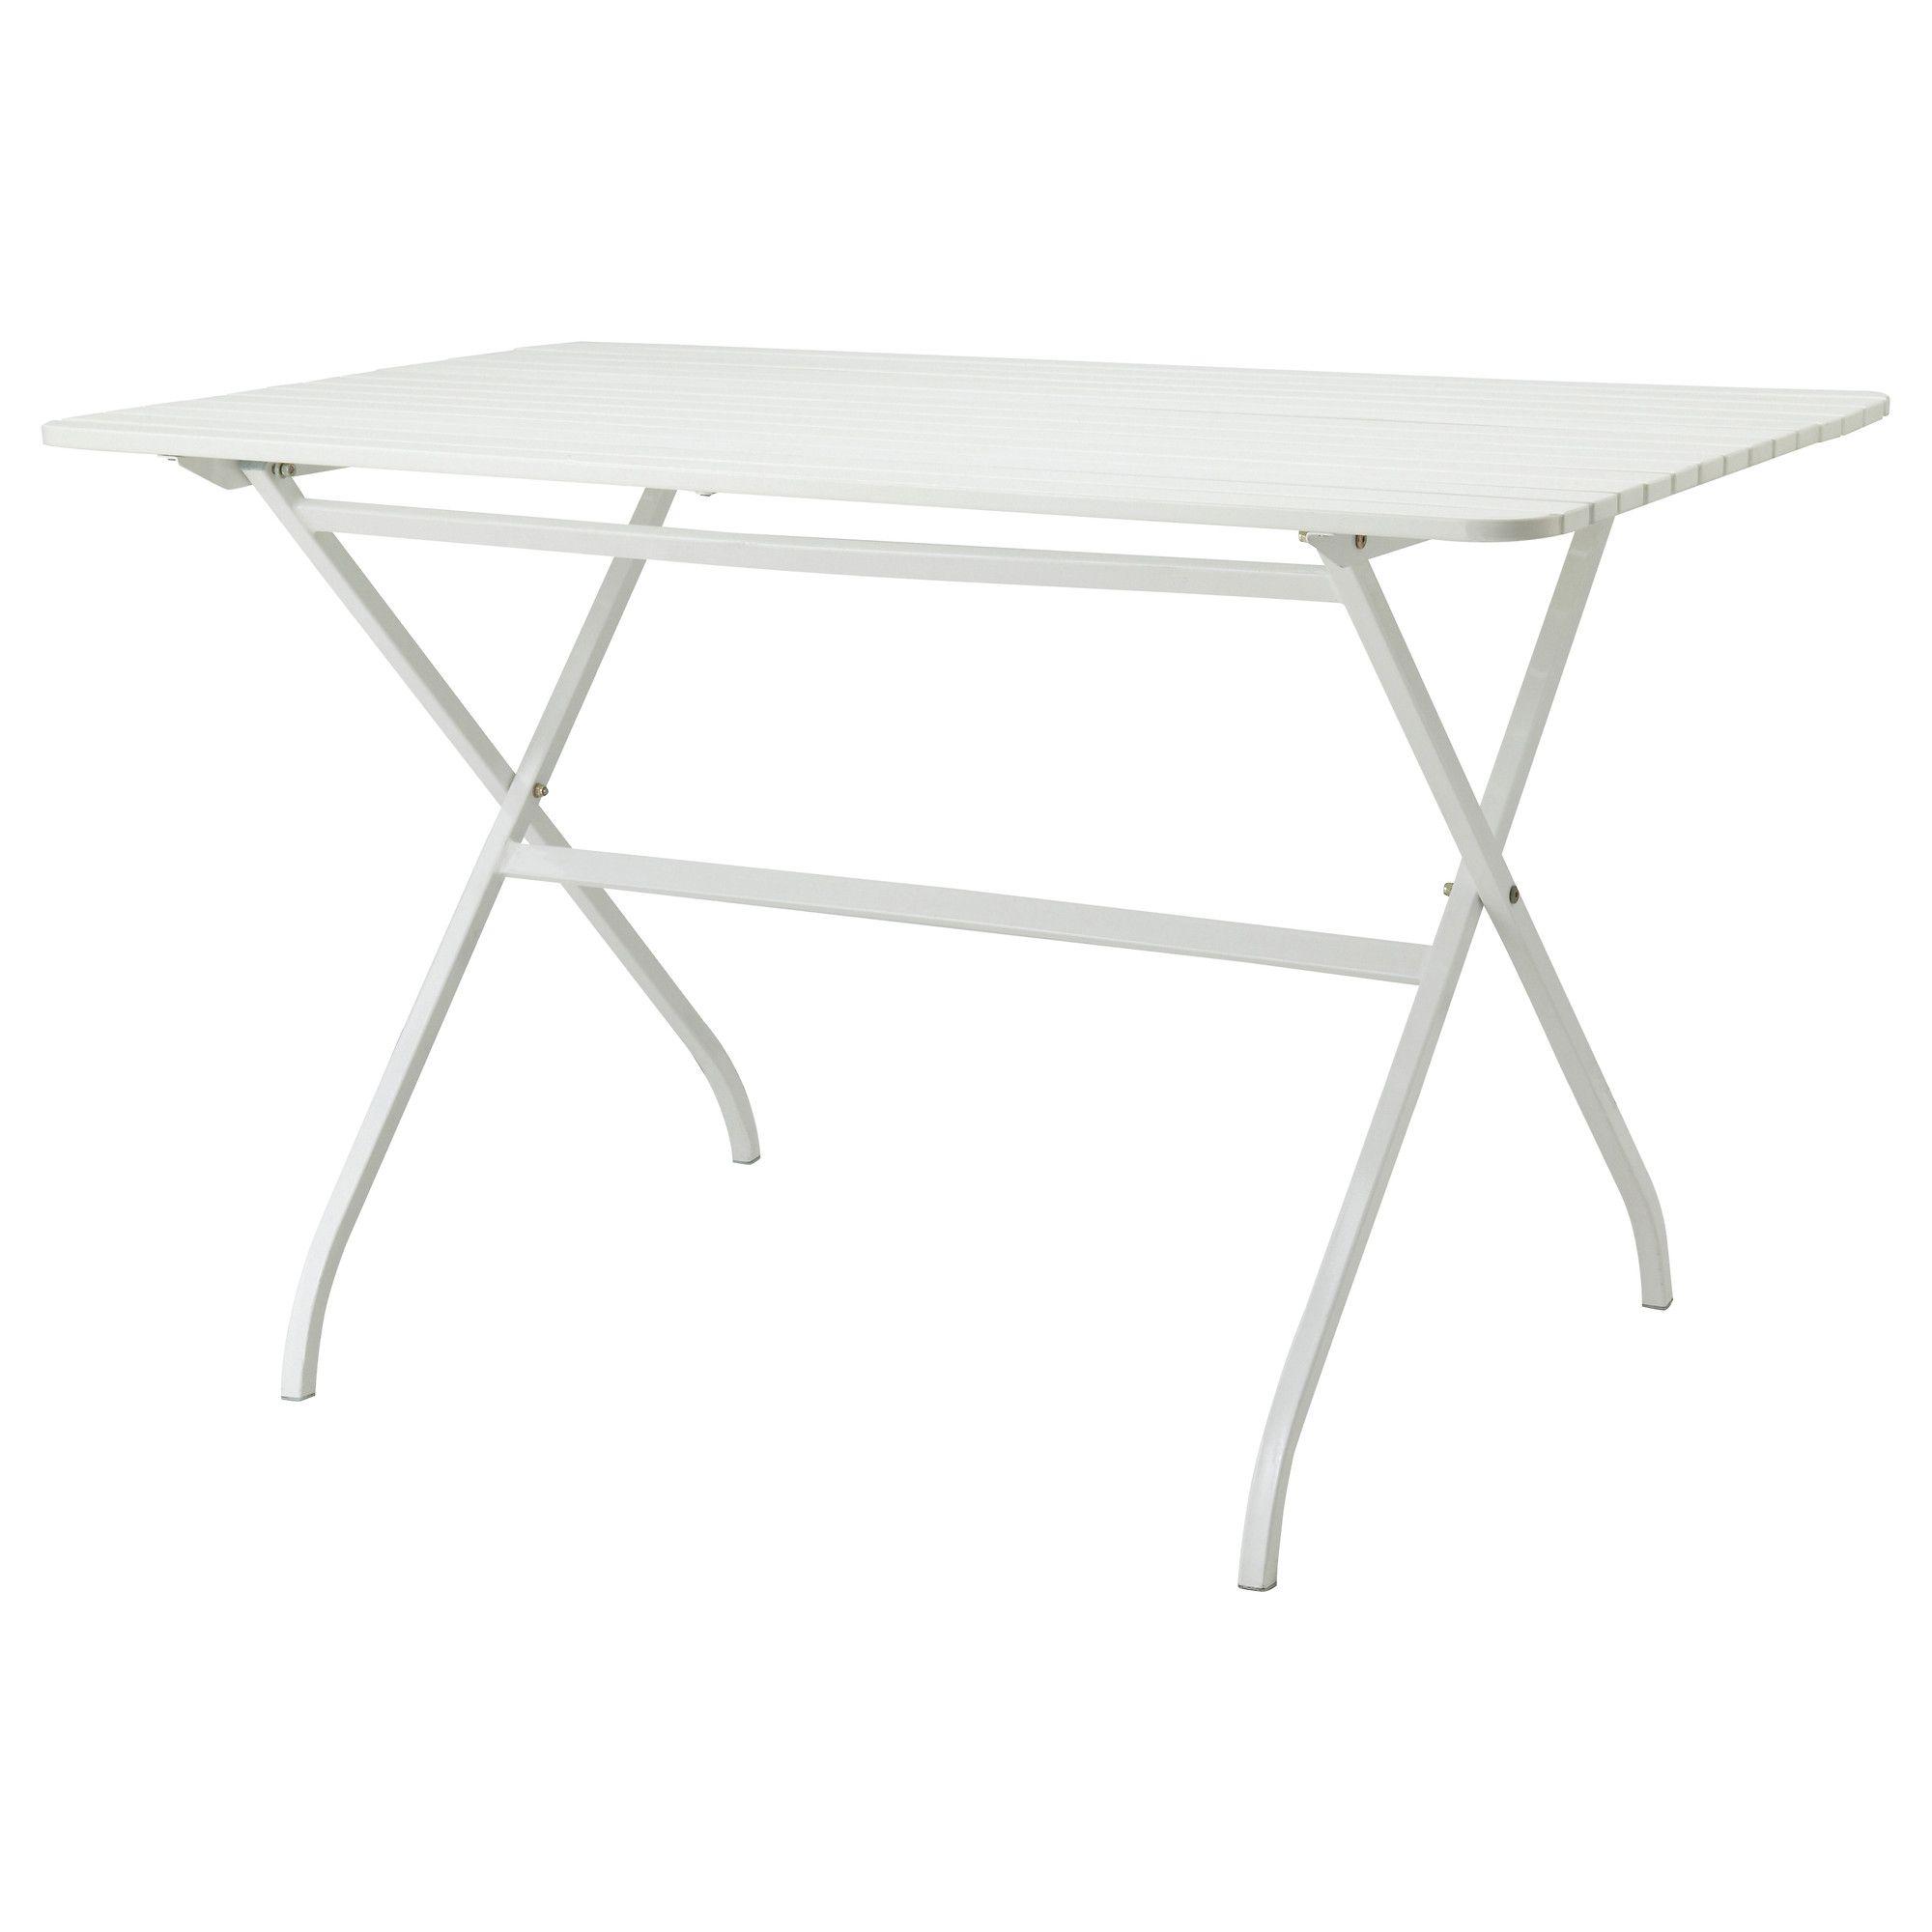 7055cb8b6b7 MÄLARÖ Table - white